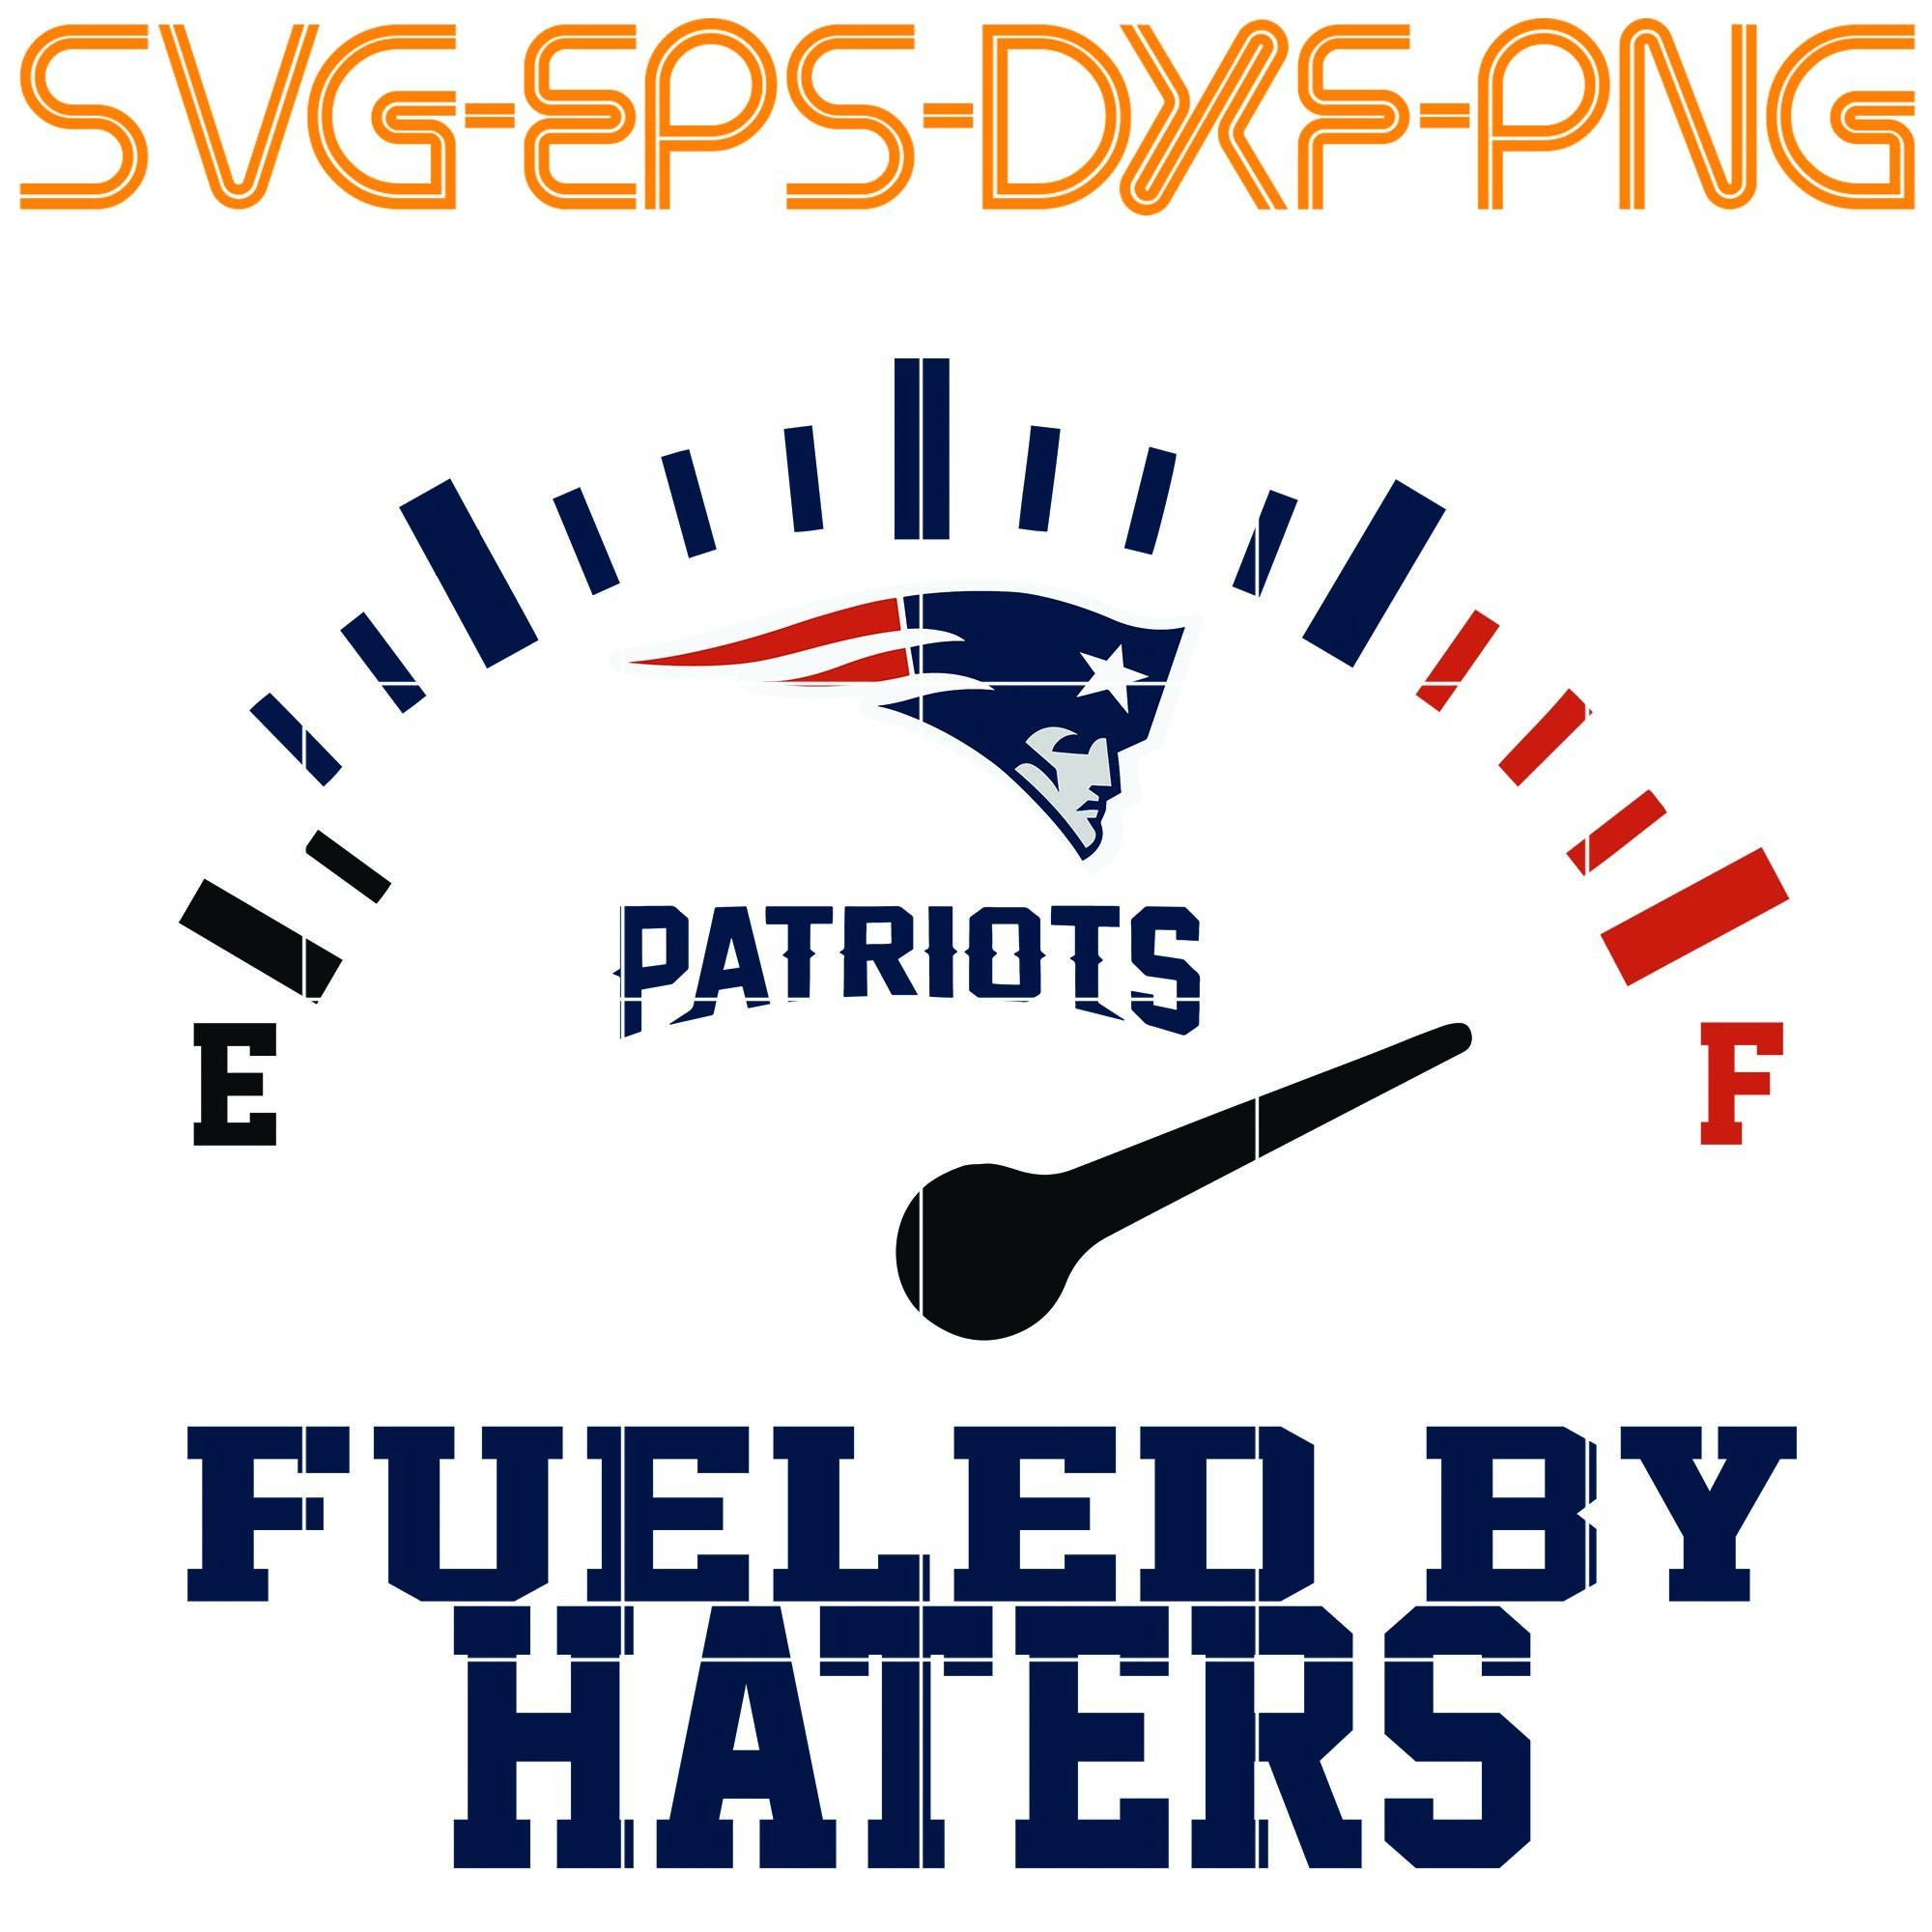 Ghim Trên New England Patriots SVG, PNG, EPS, DXF, Digital